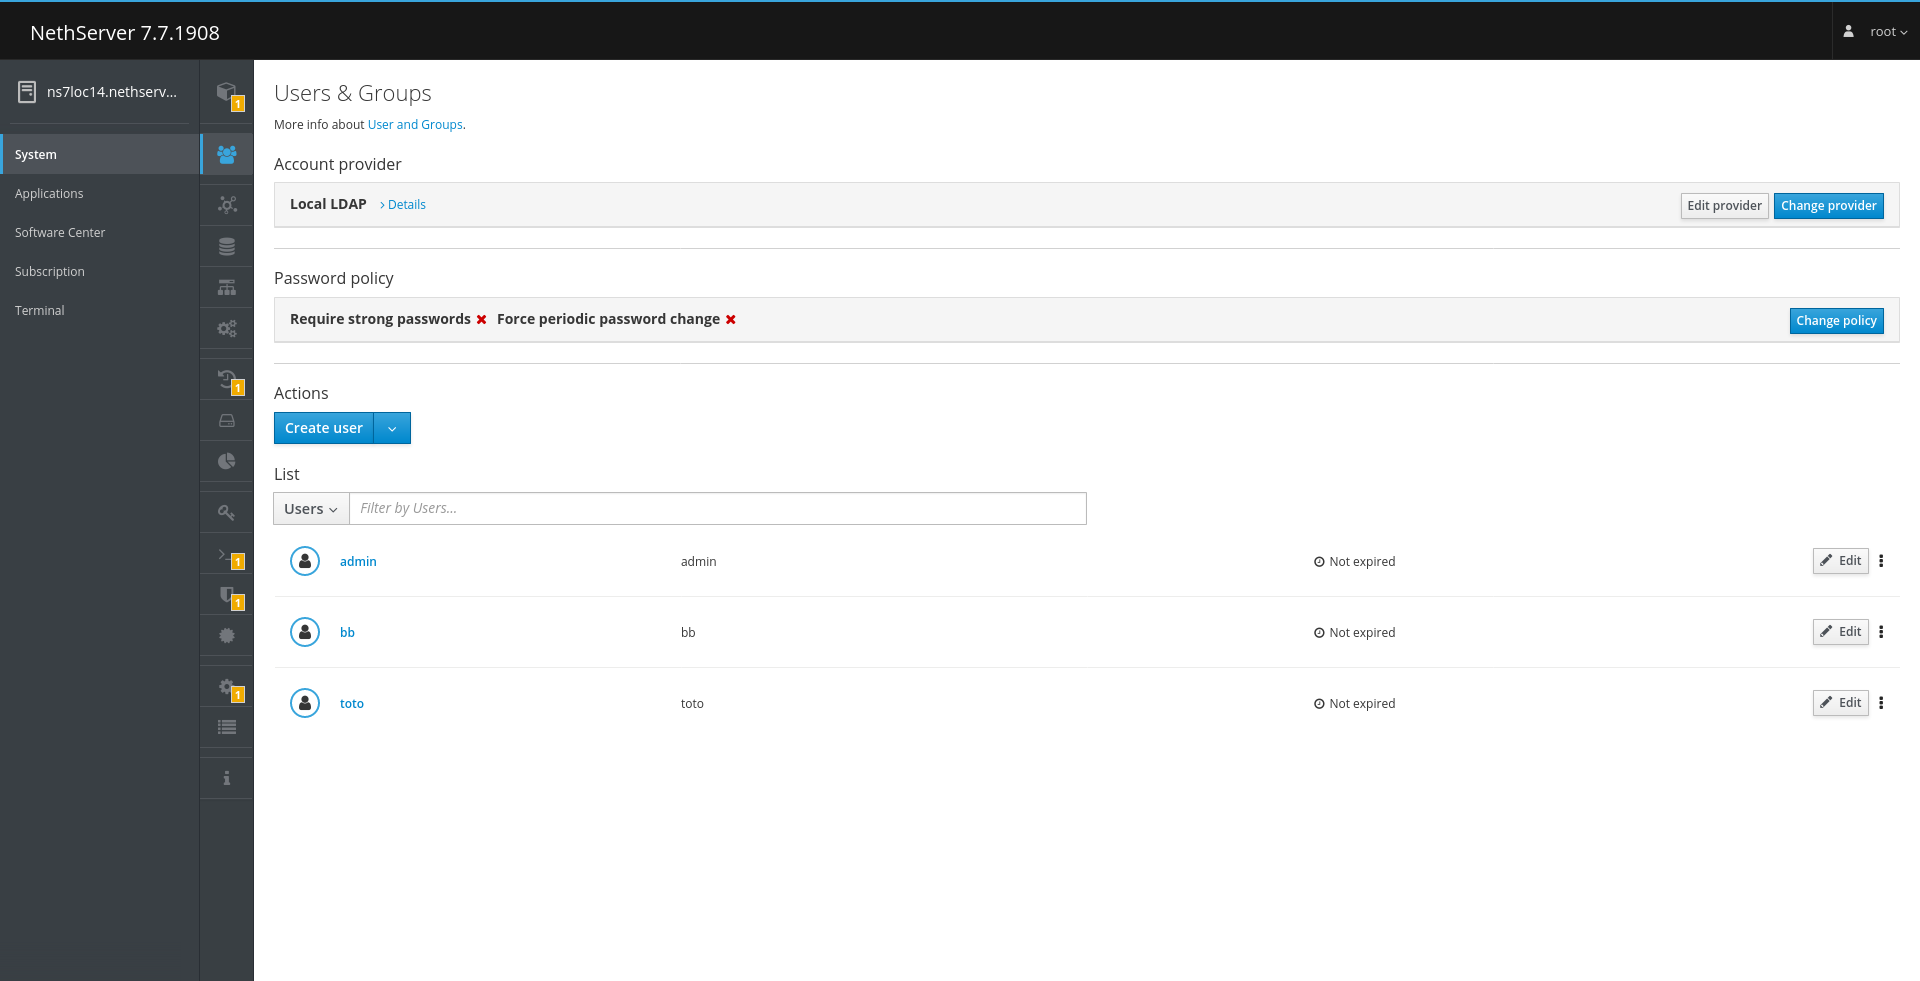 Screenshot_2019-12-08 Users Groups - ns7loc14 nethservertest org(1)